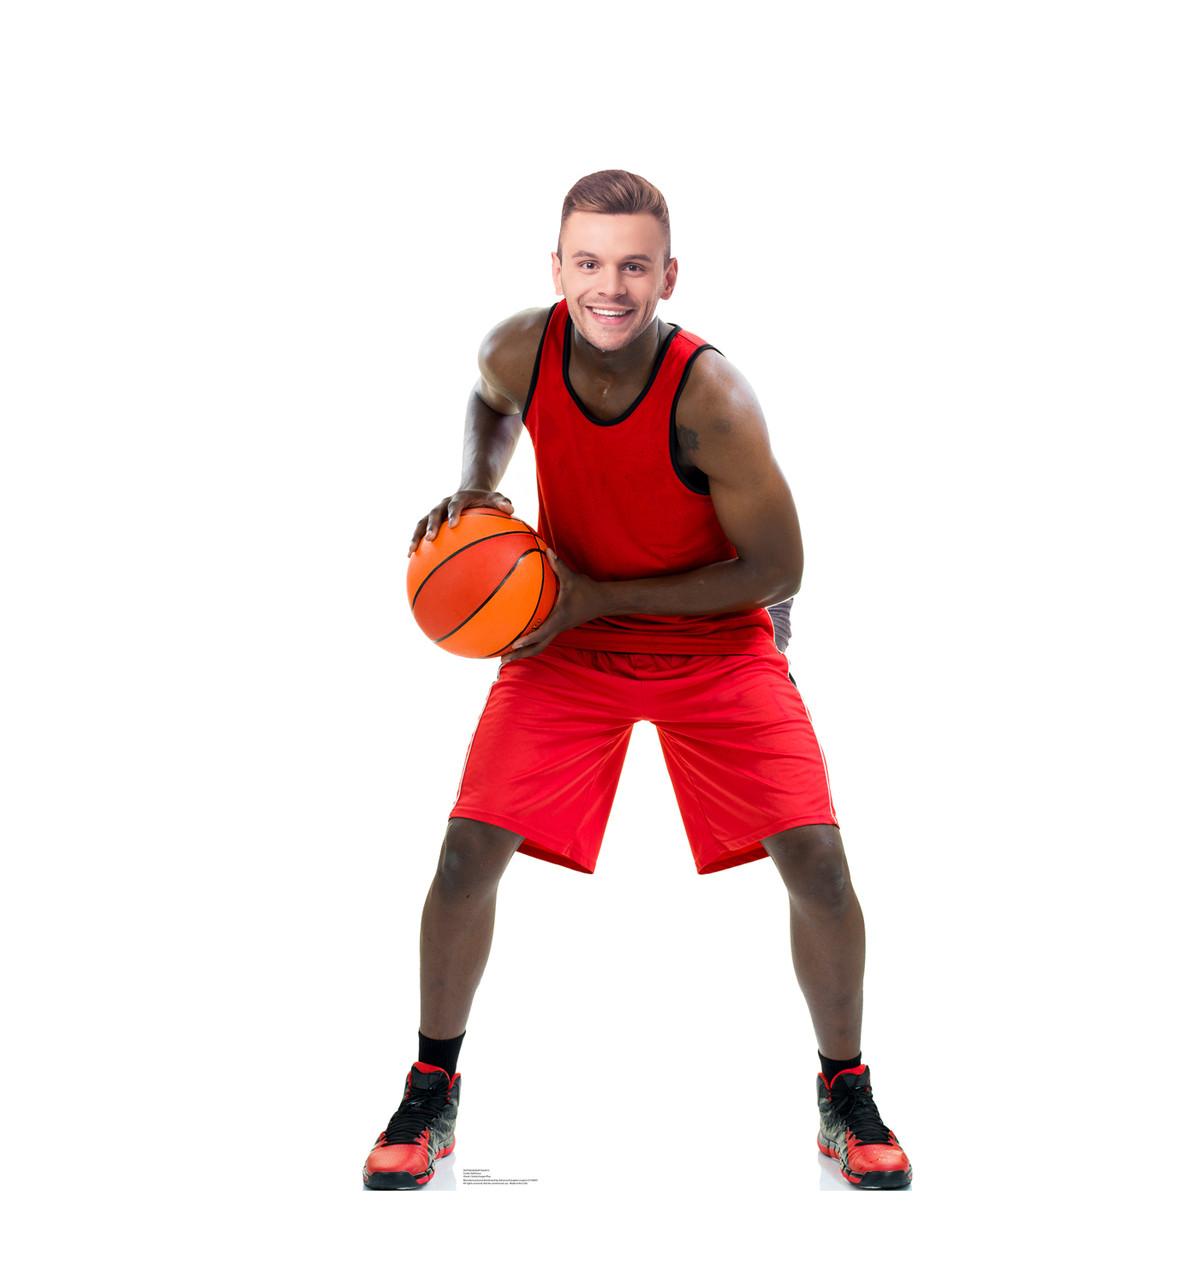 Life-size Basketball Player Stand-In Cardboard Standup   Cardboard Cutout 3